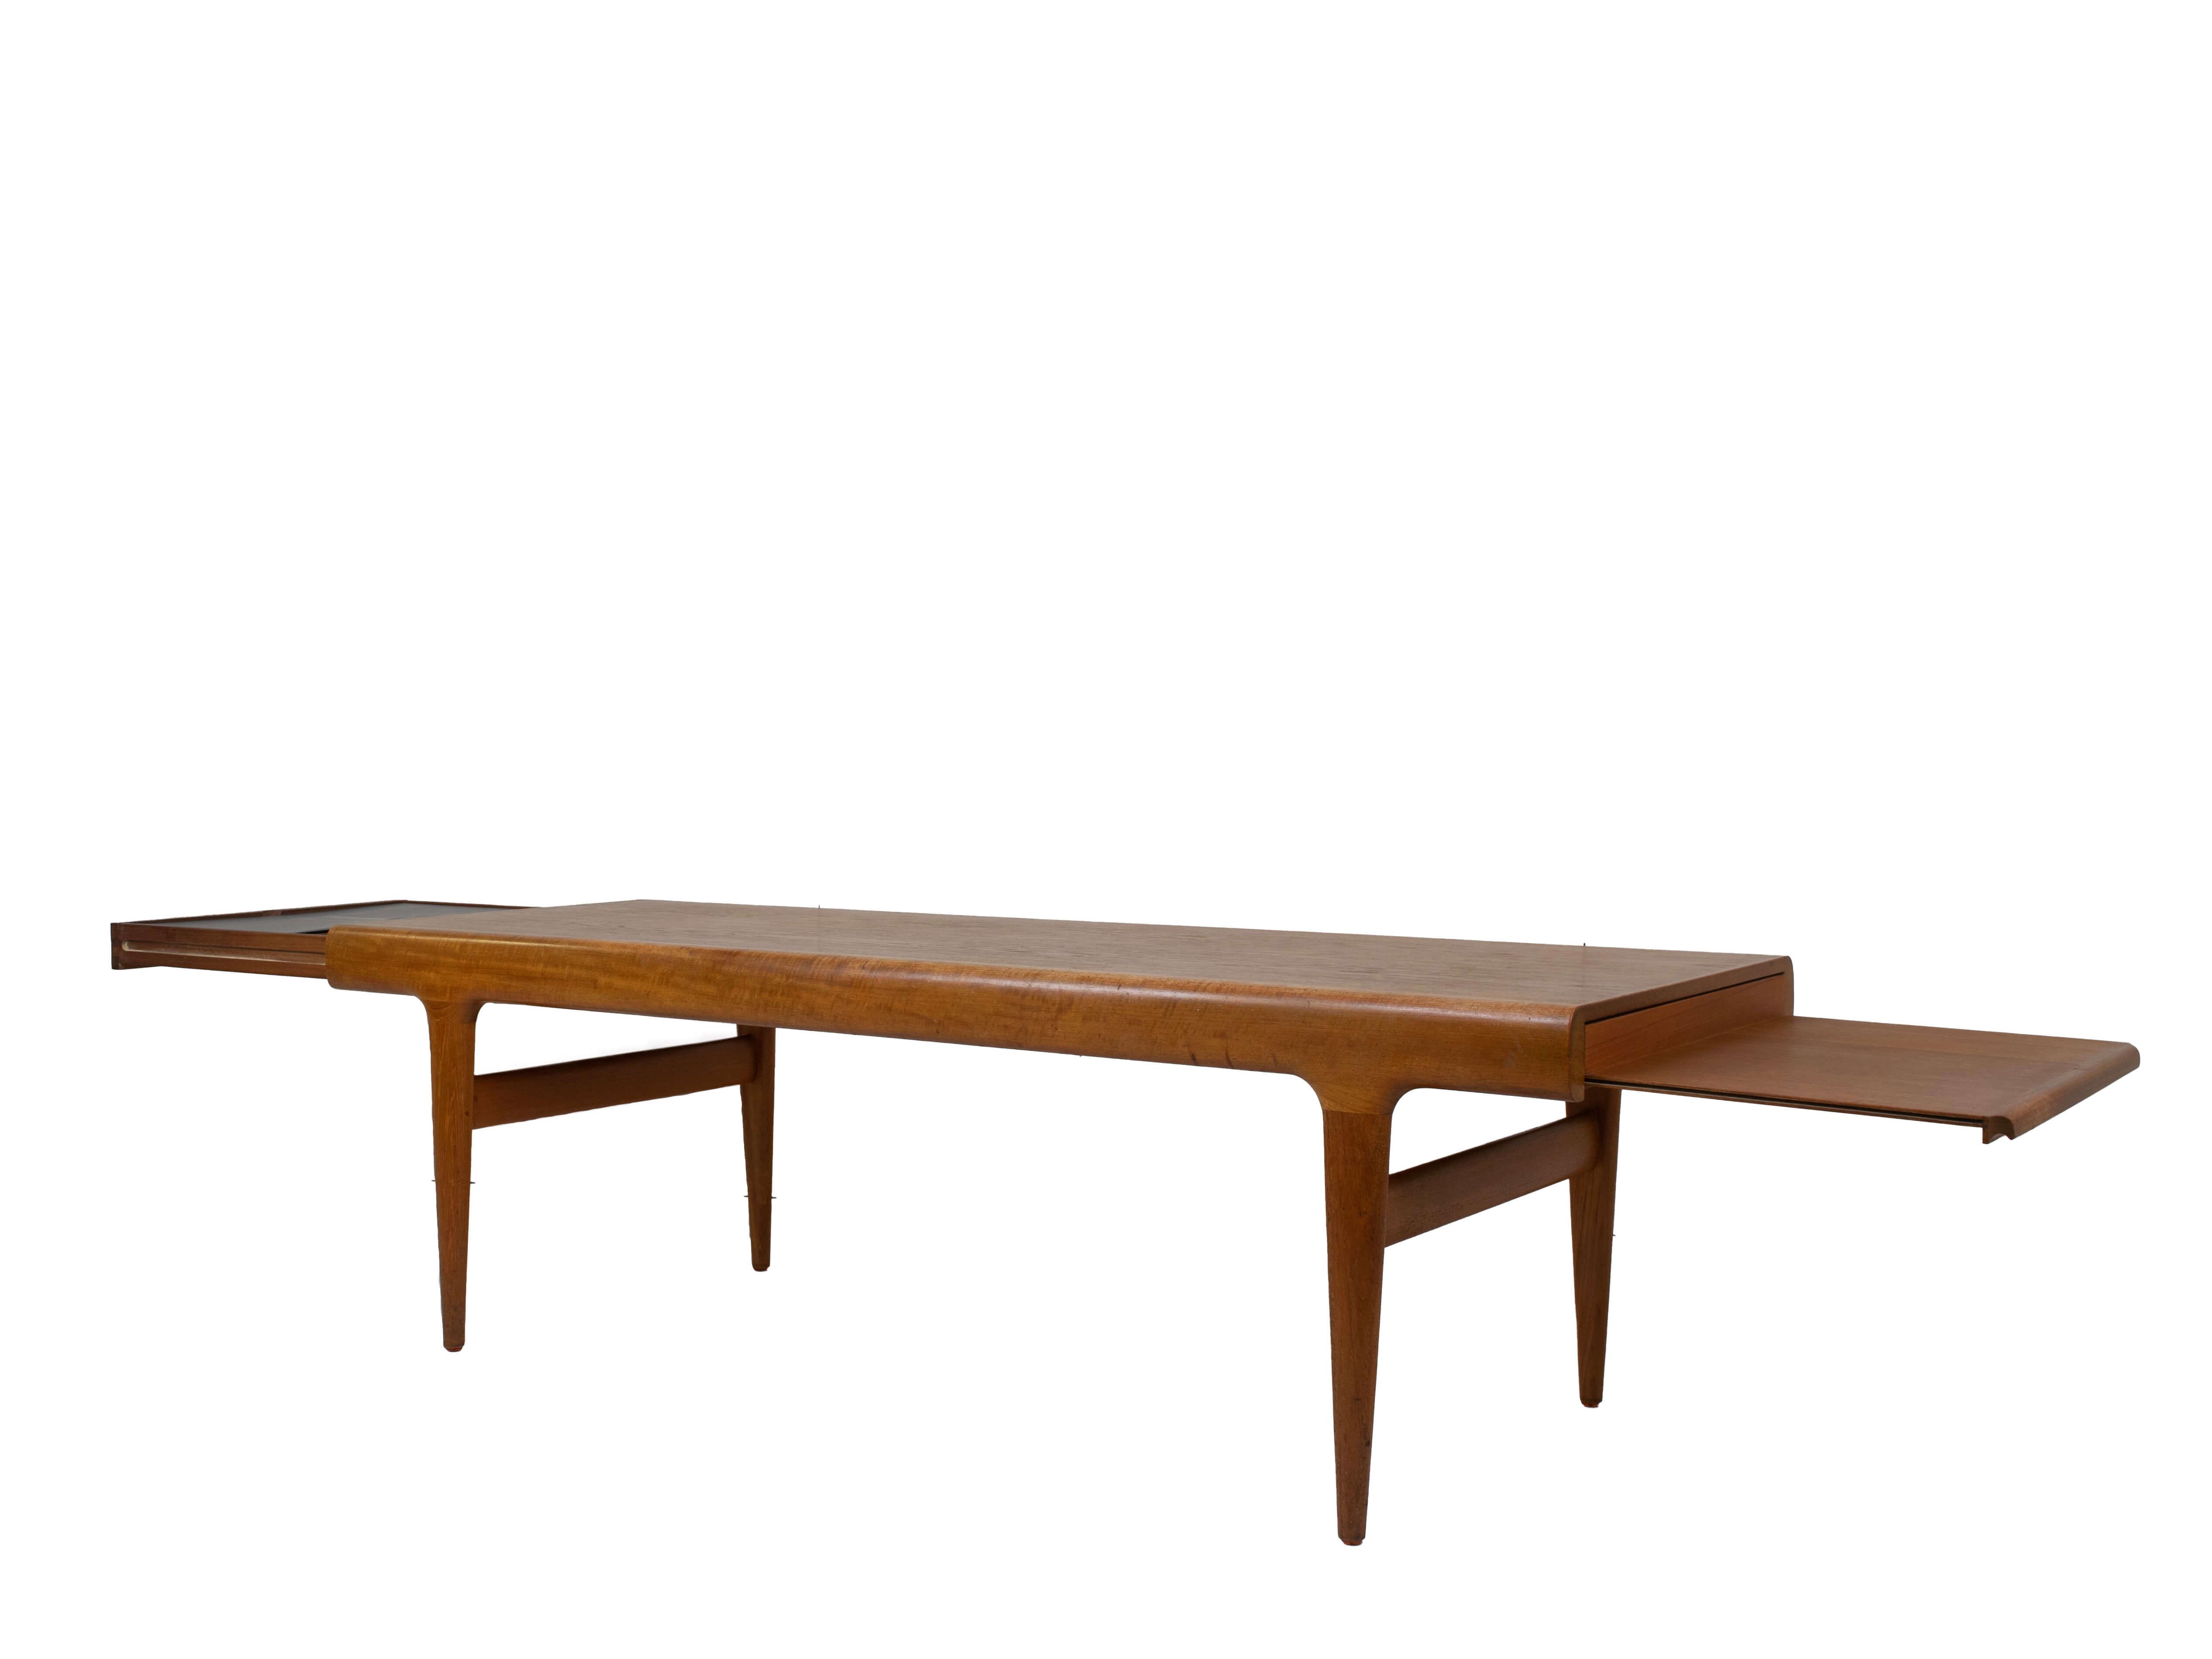 Johannes Andersen Extendable Teak Coffee Table for Uldum Møbelfabrik, Denmark 1960s